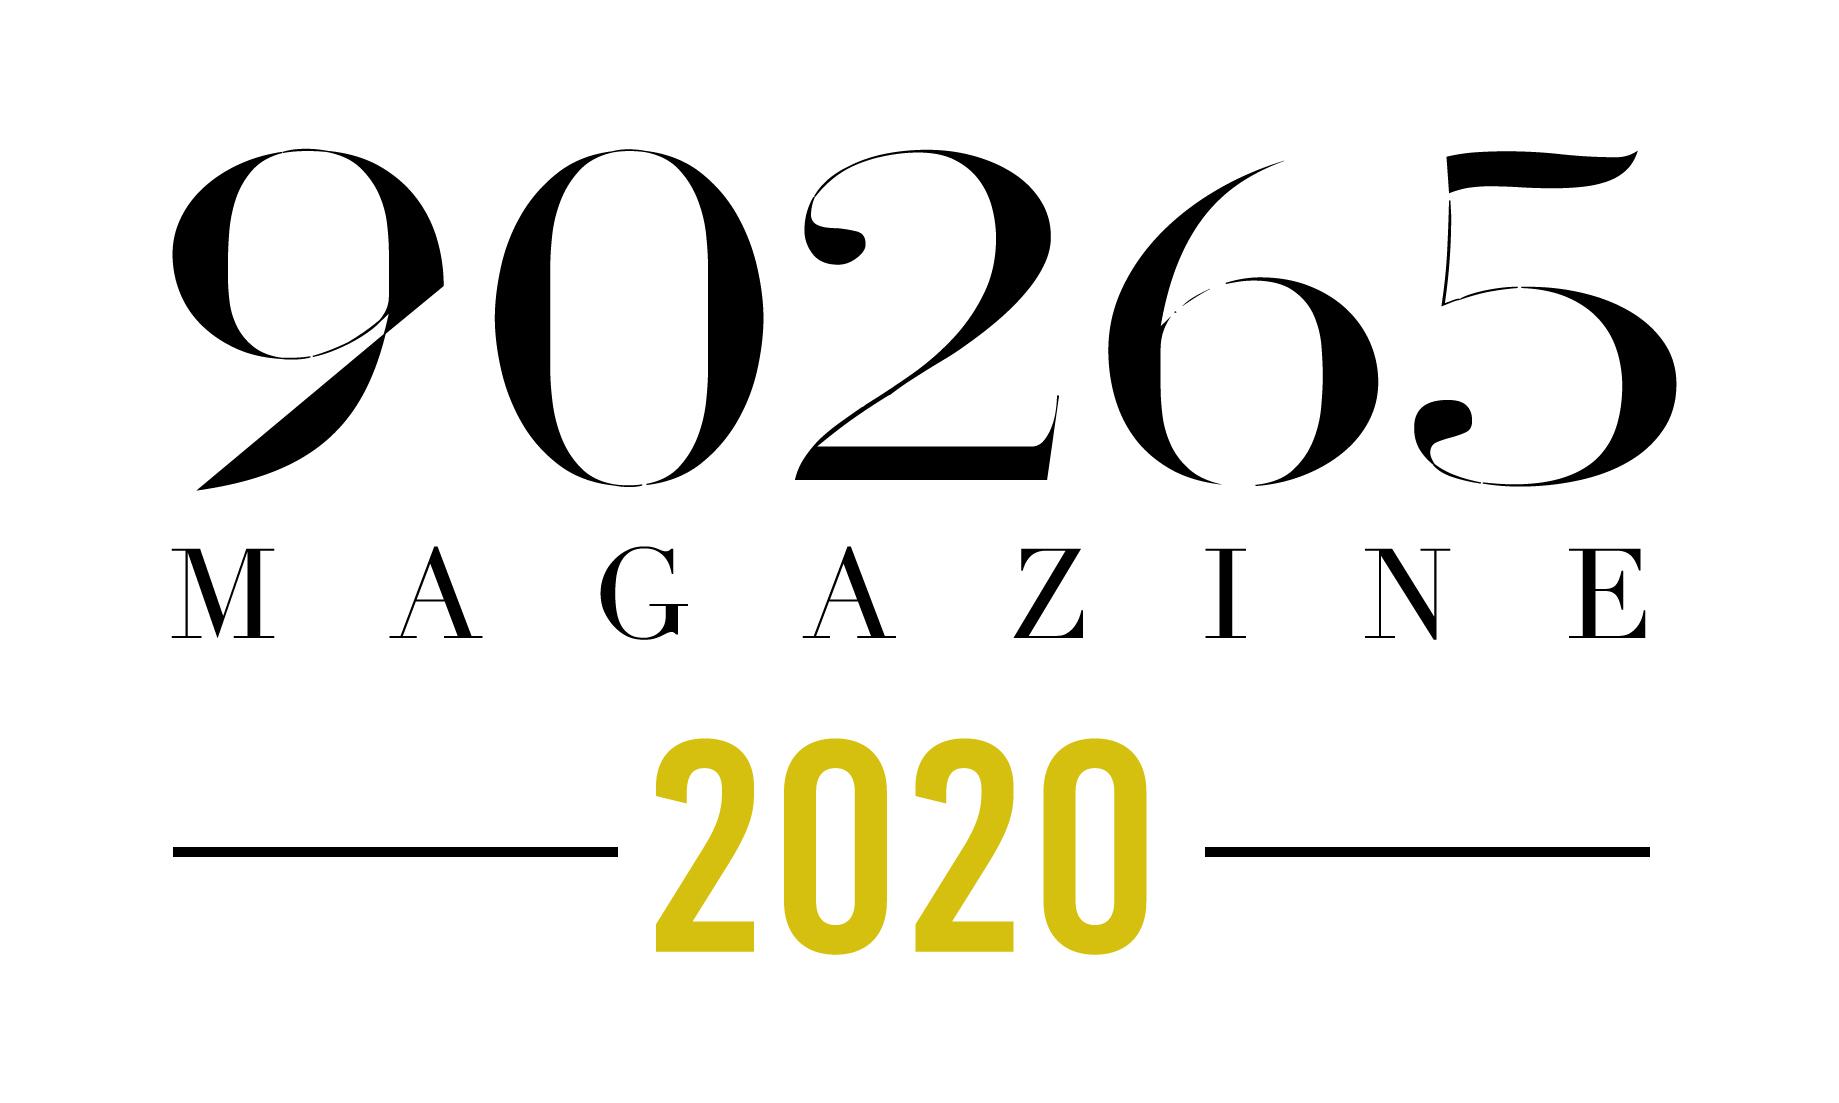 Malibu 90265 Magazine